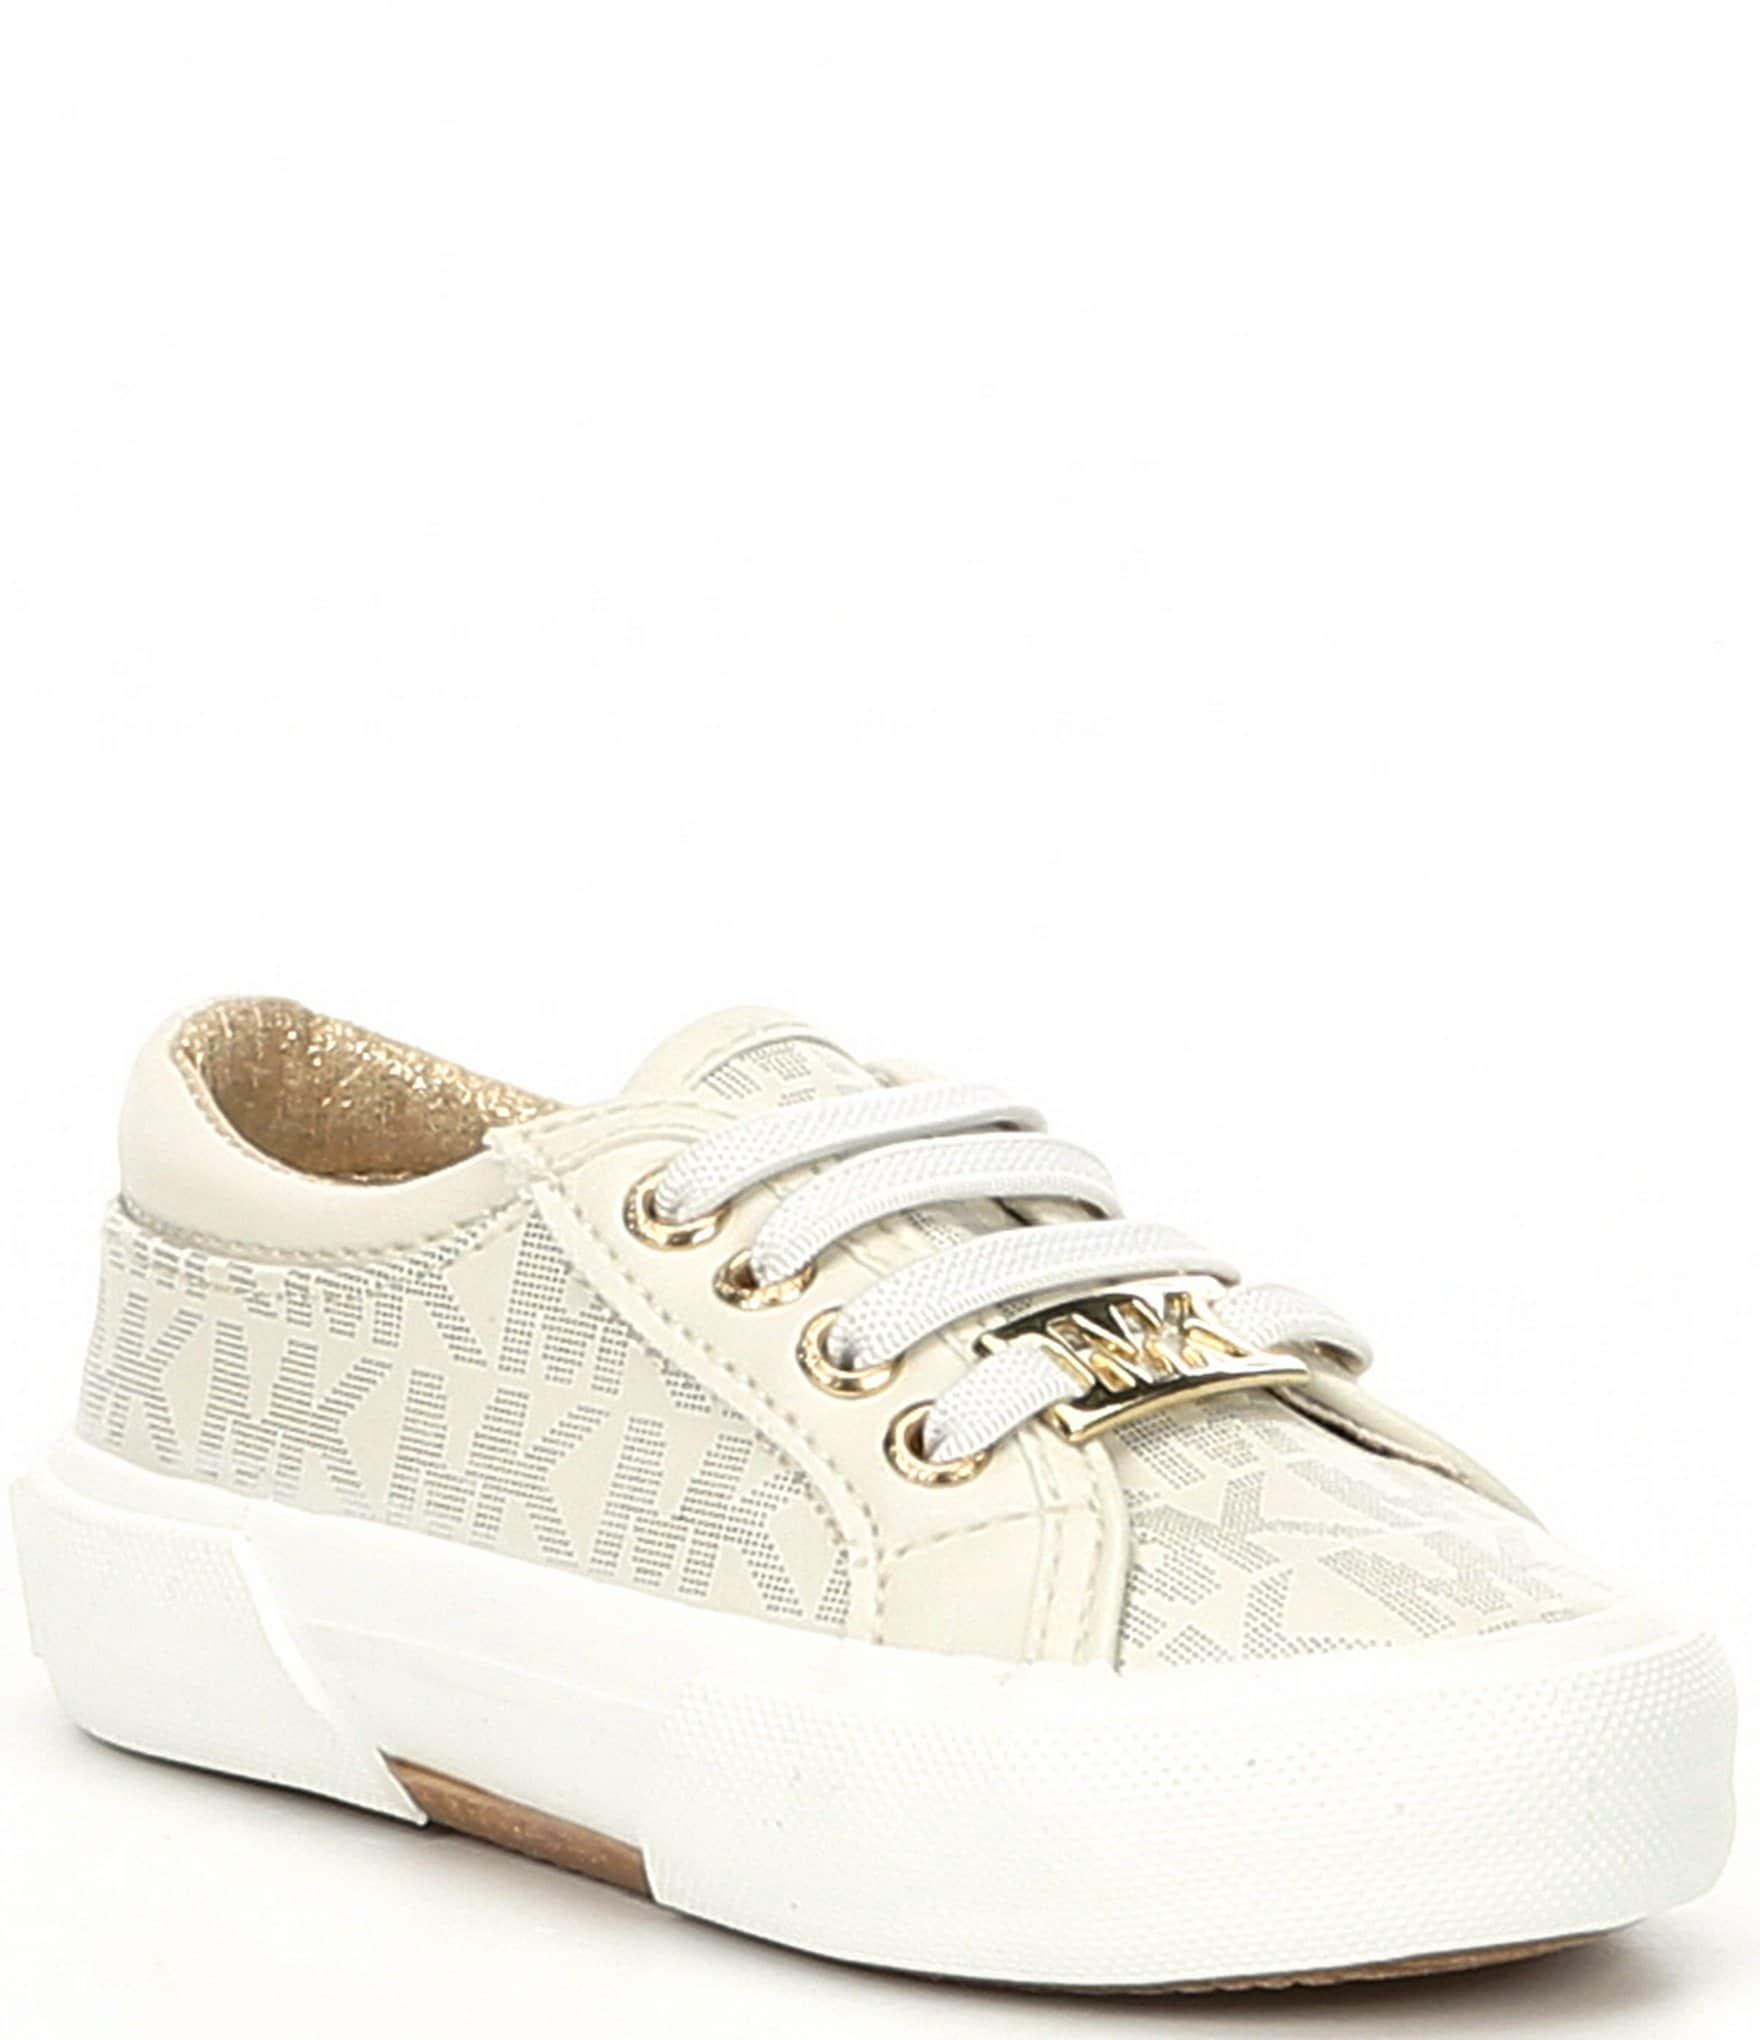 ccbed21af MICHAEL Michael Kors Baby Girls' Shoes | Dillard's